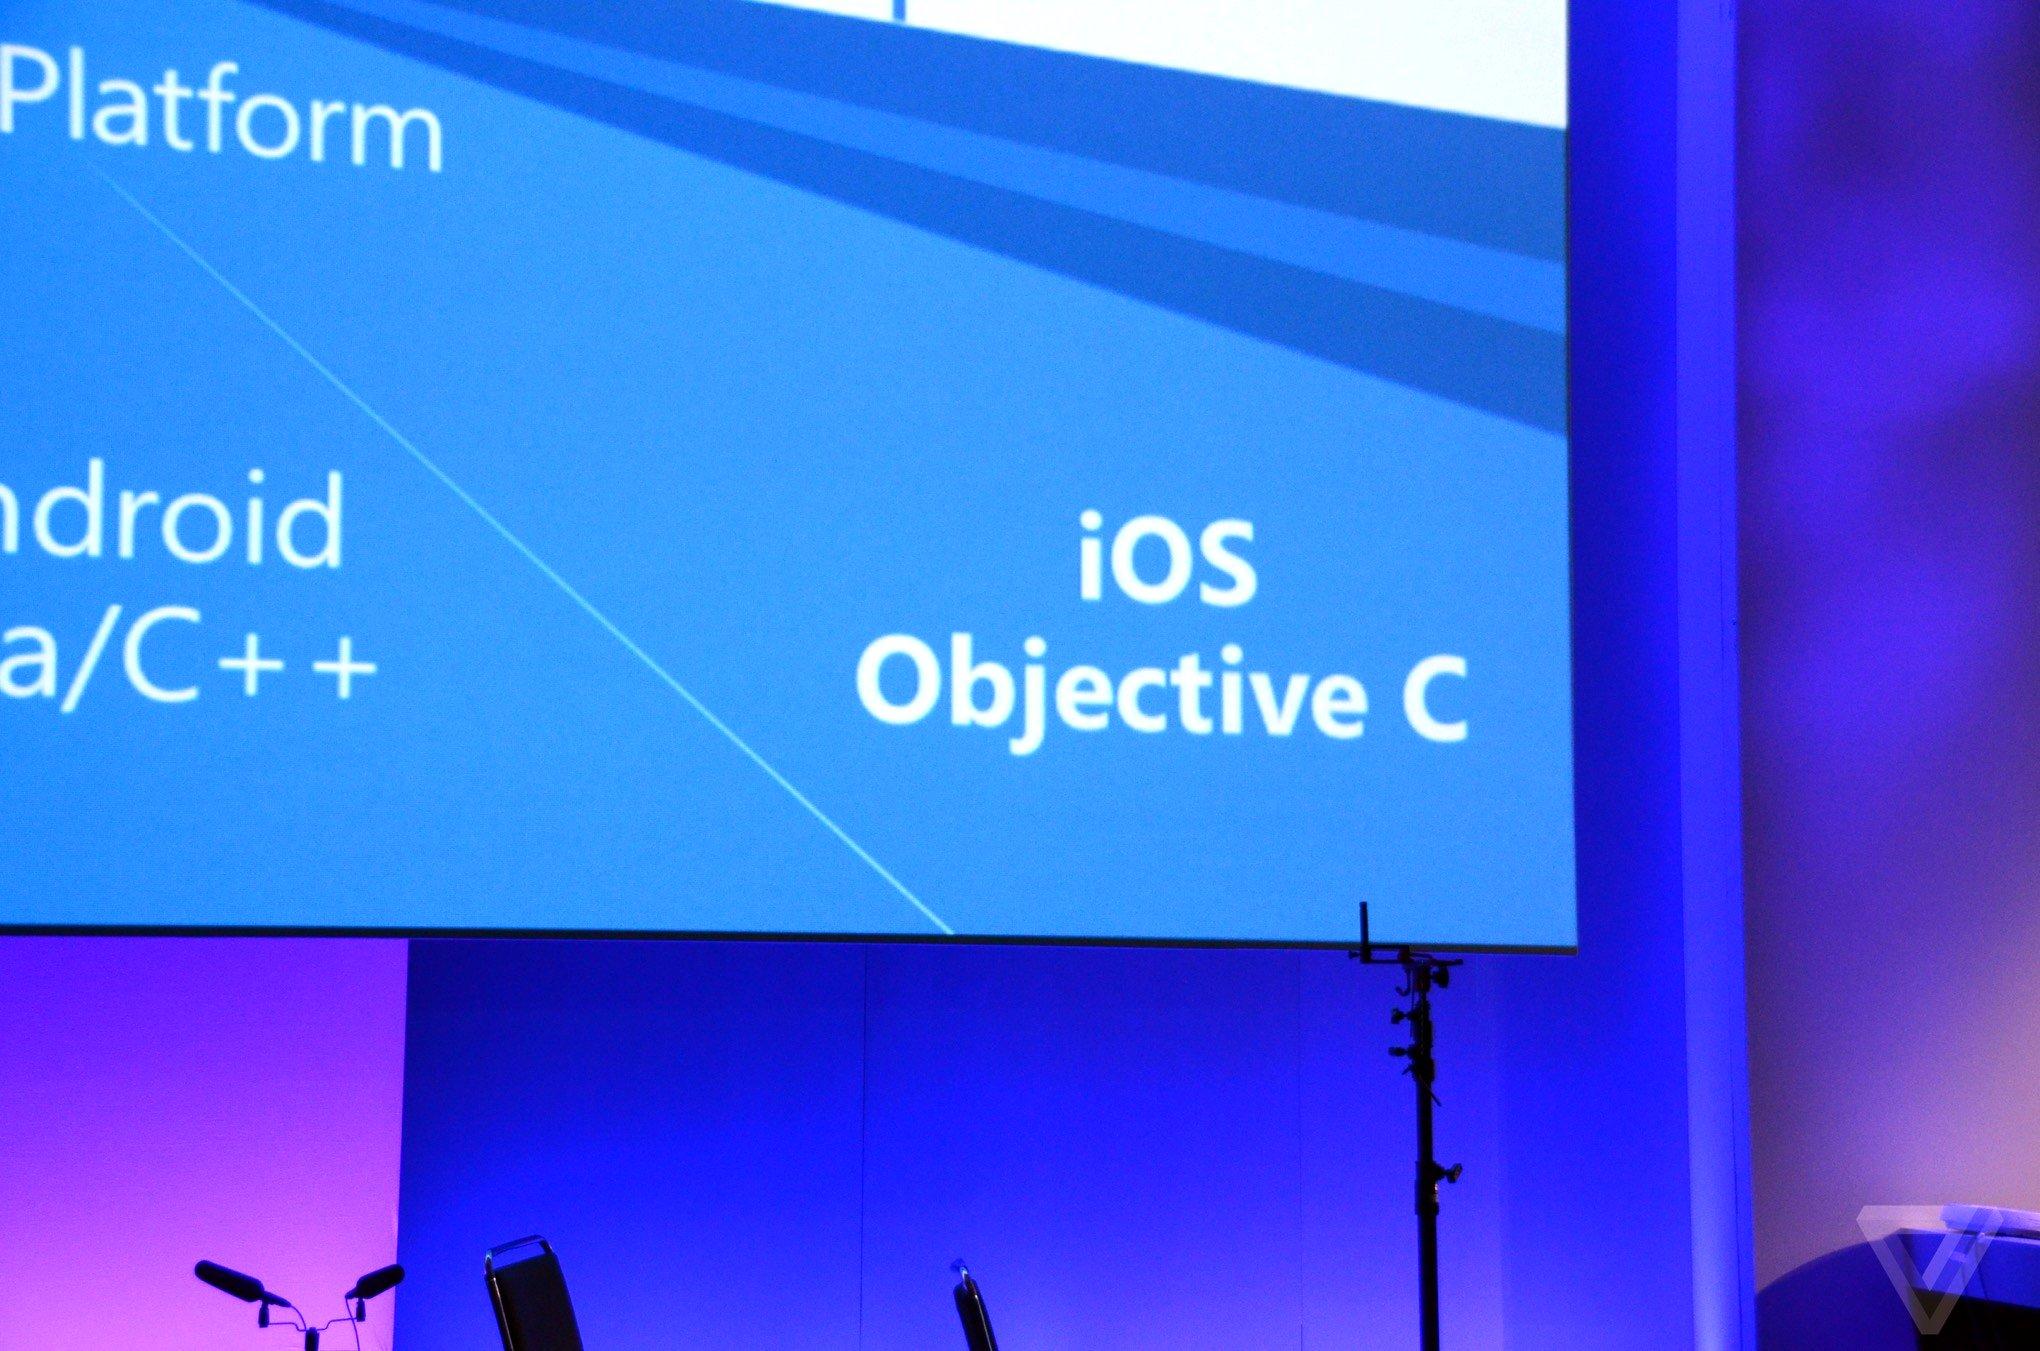 Windows 10 runs iOS app